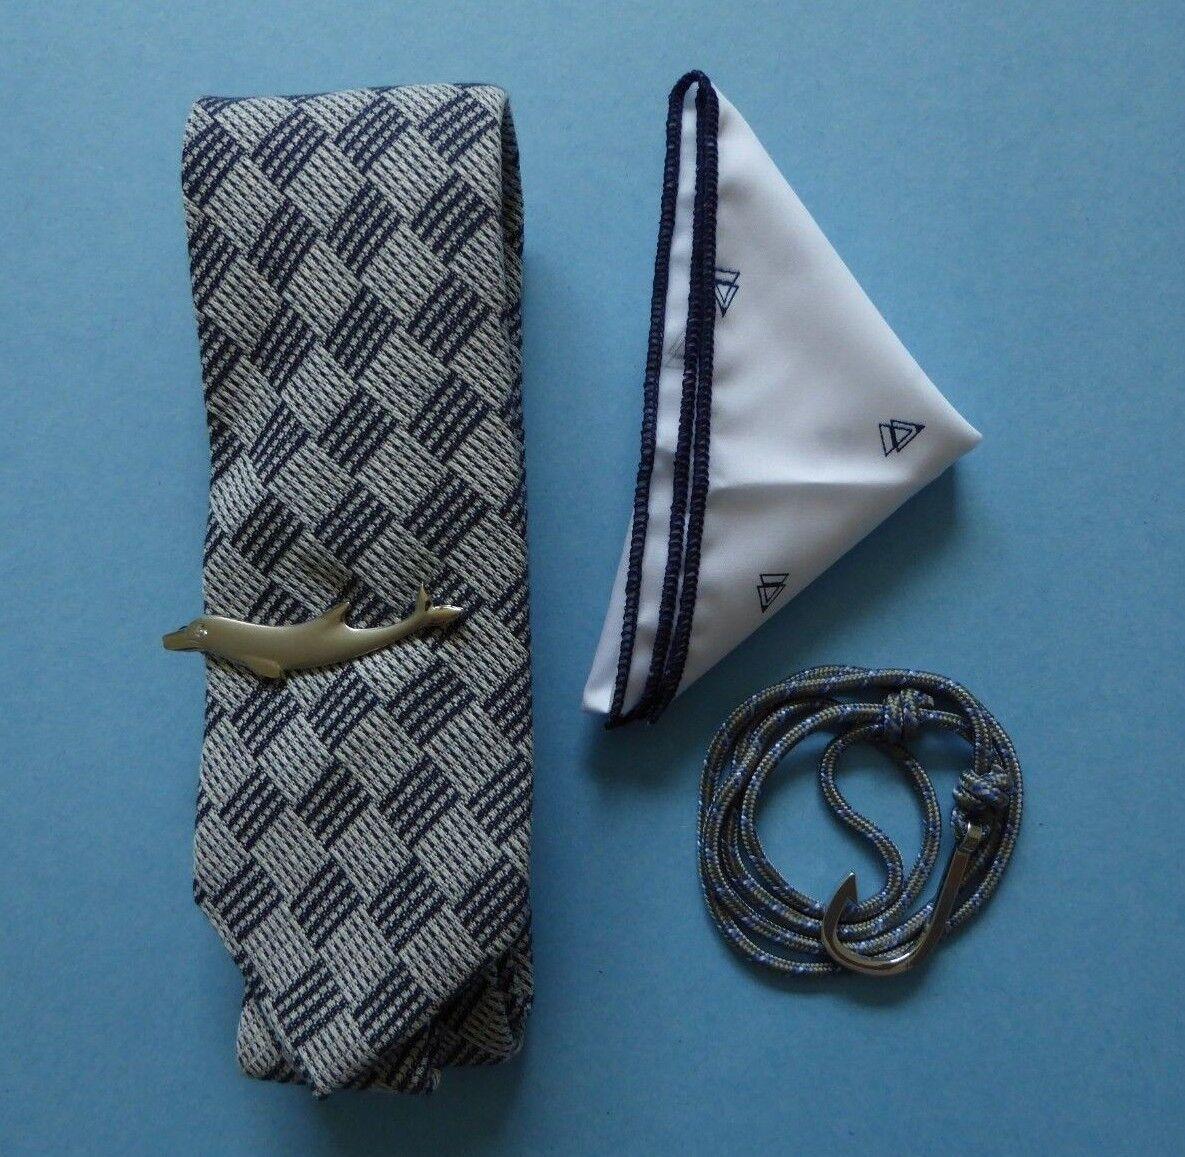 Harrison Blake Blue Block Tie + HB Pocket Square + Dolphin Tie Bar + Bracelet